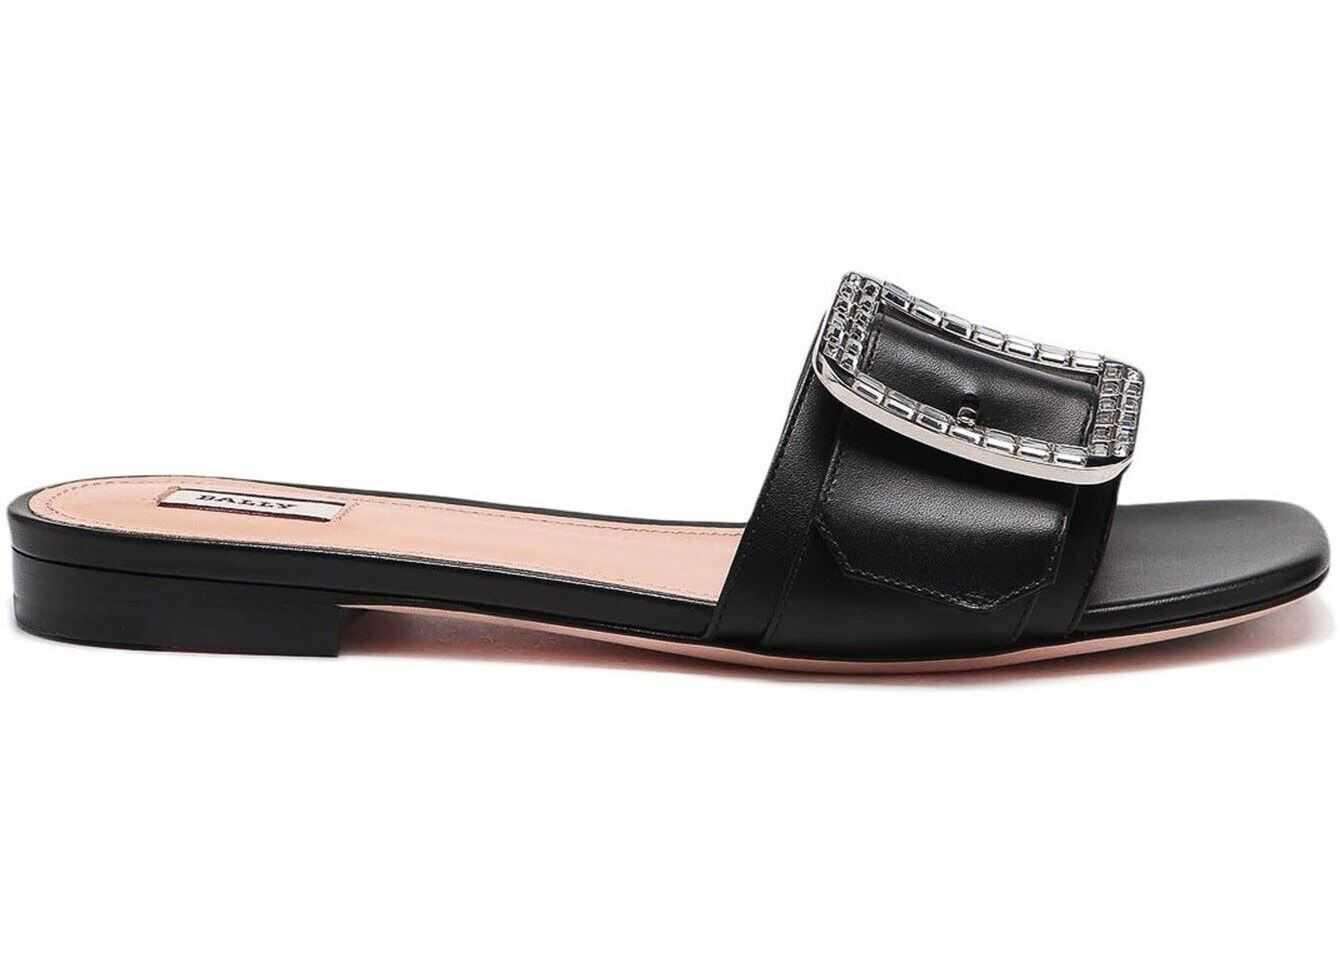 Bally Janna Leather Slide Sandals Black